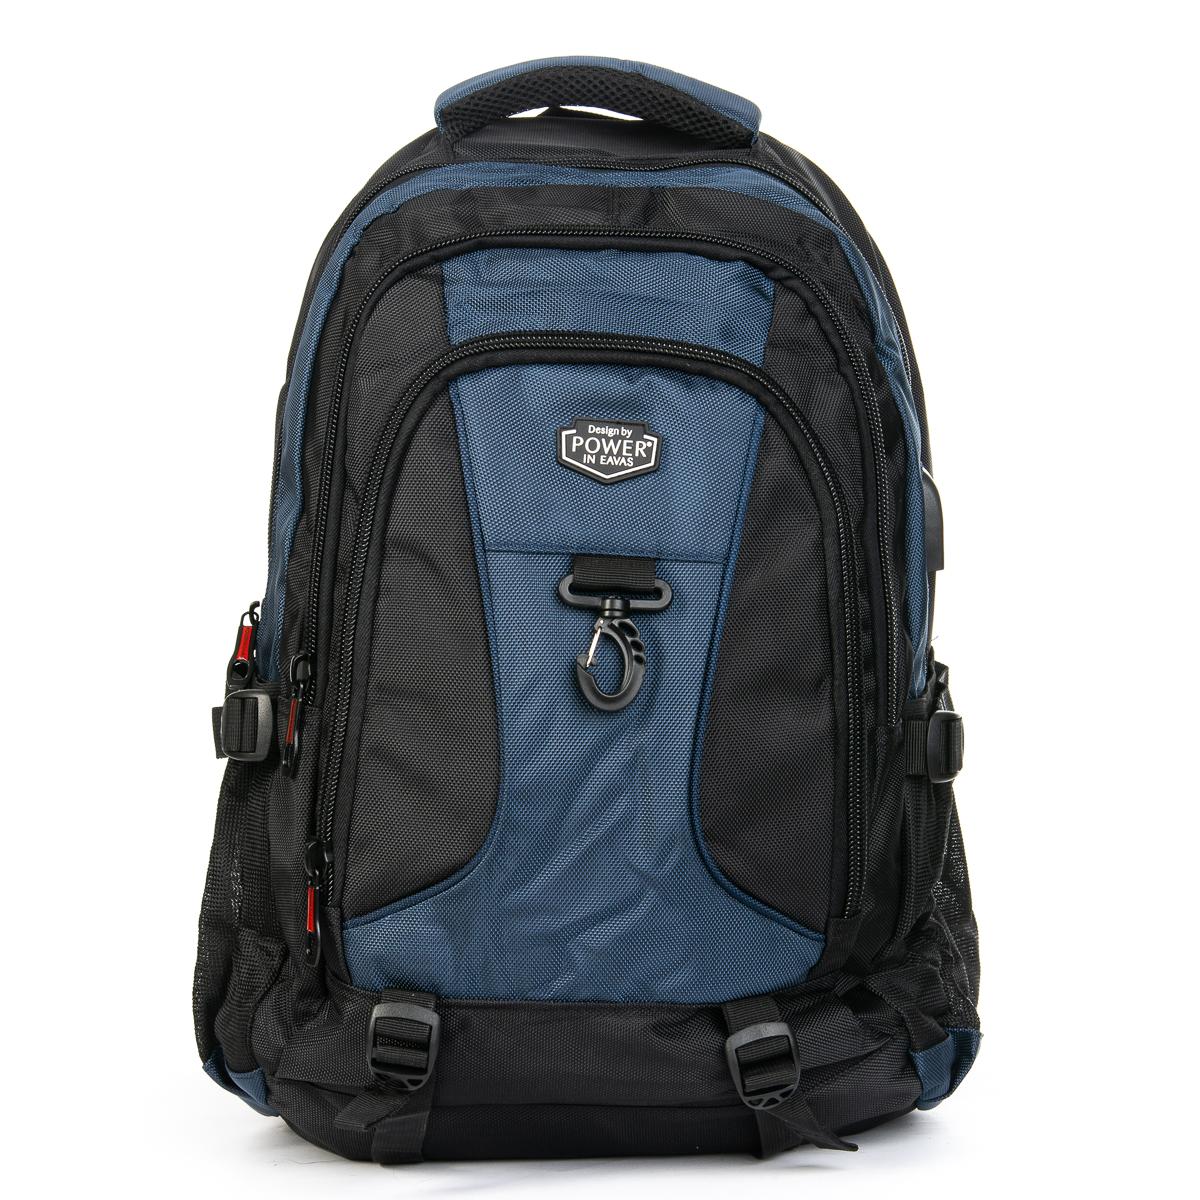 Рюкзак Городской нейлон Power In Eavas 8211 black-blue